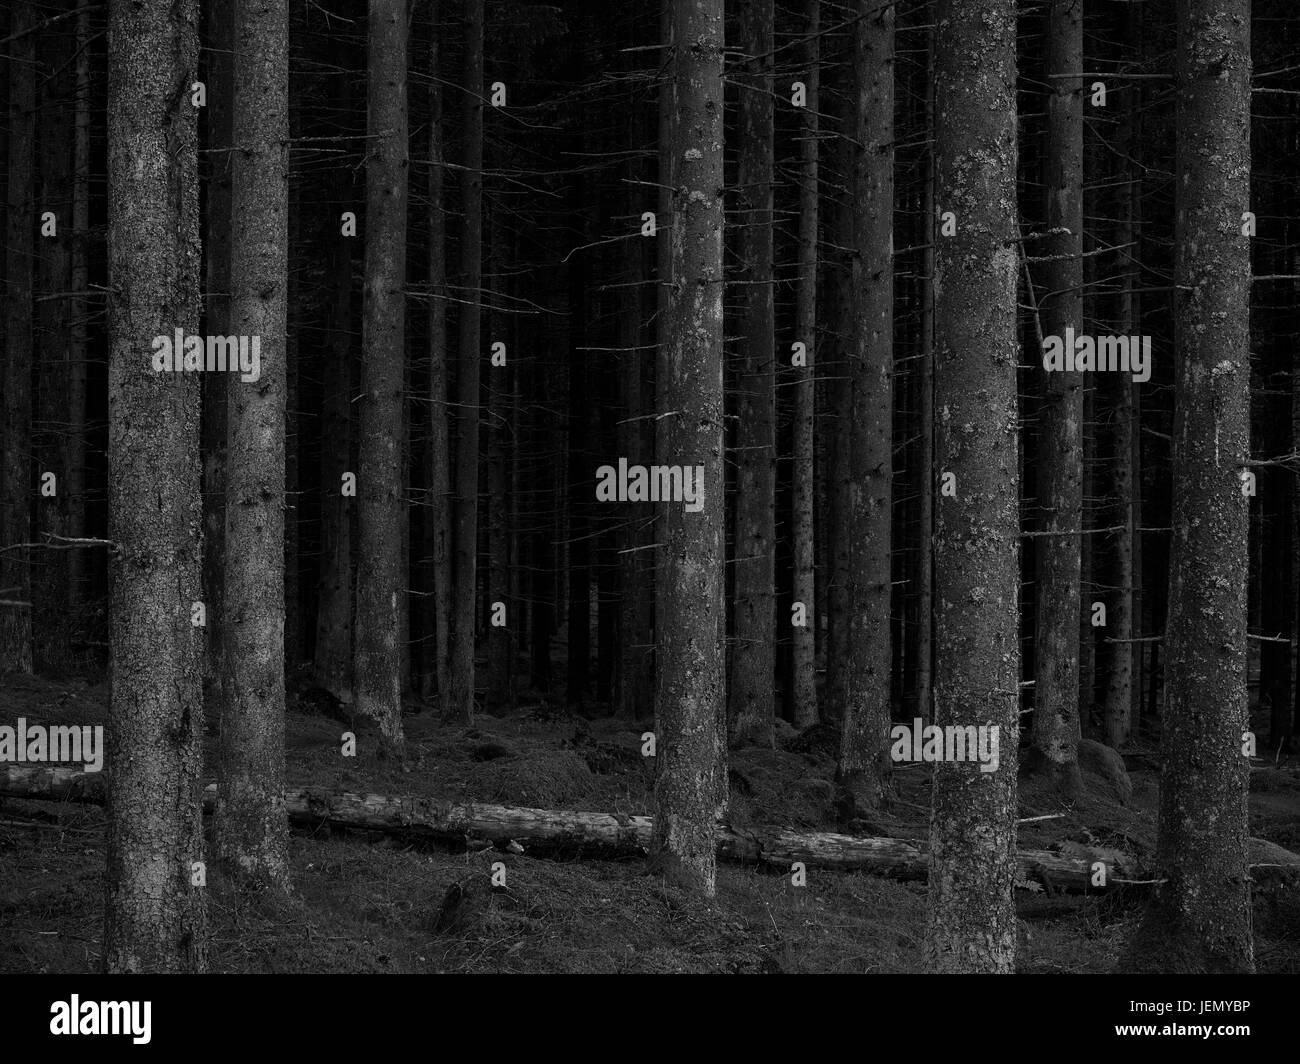 Tree trunks - Stock Image